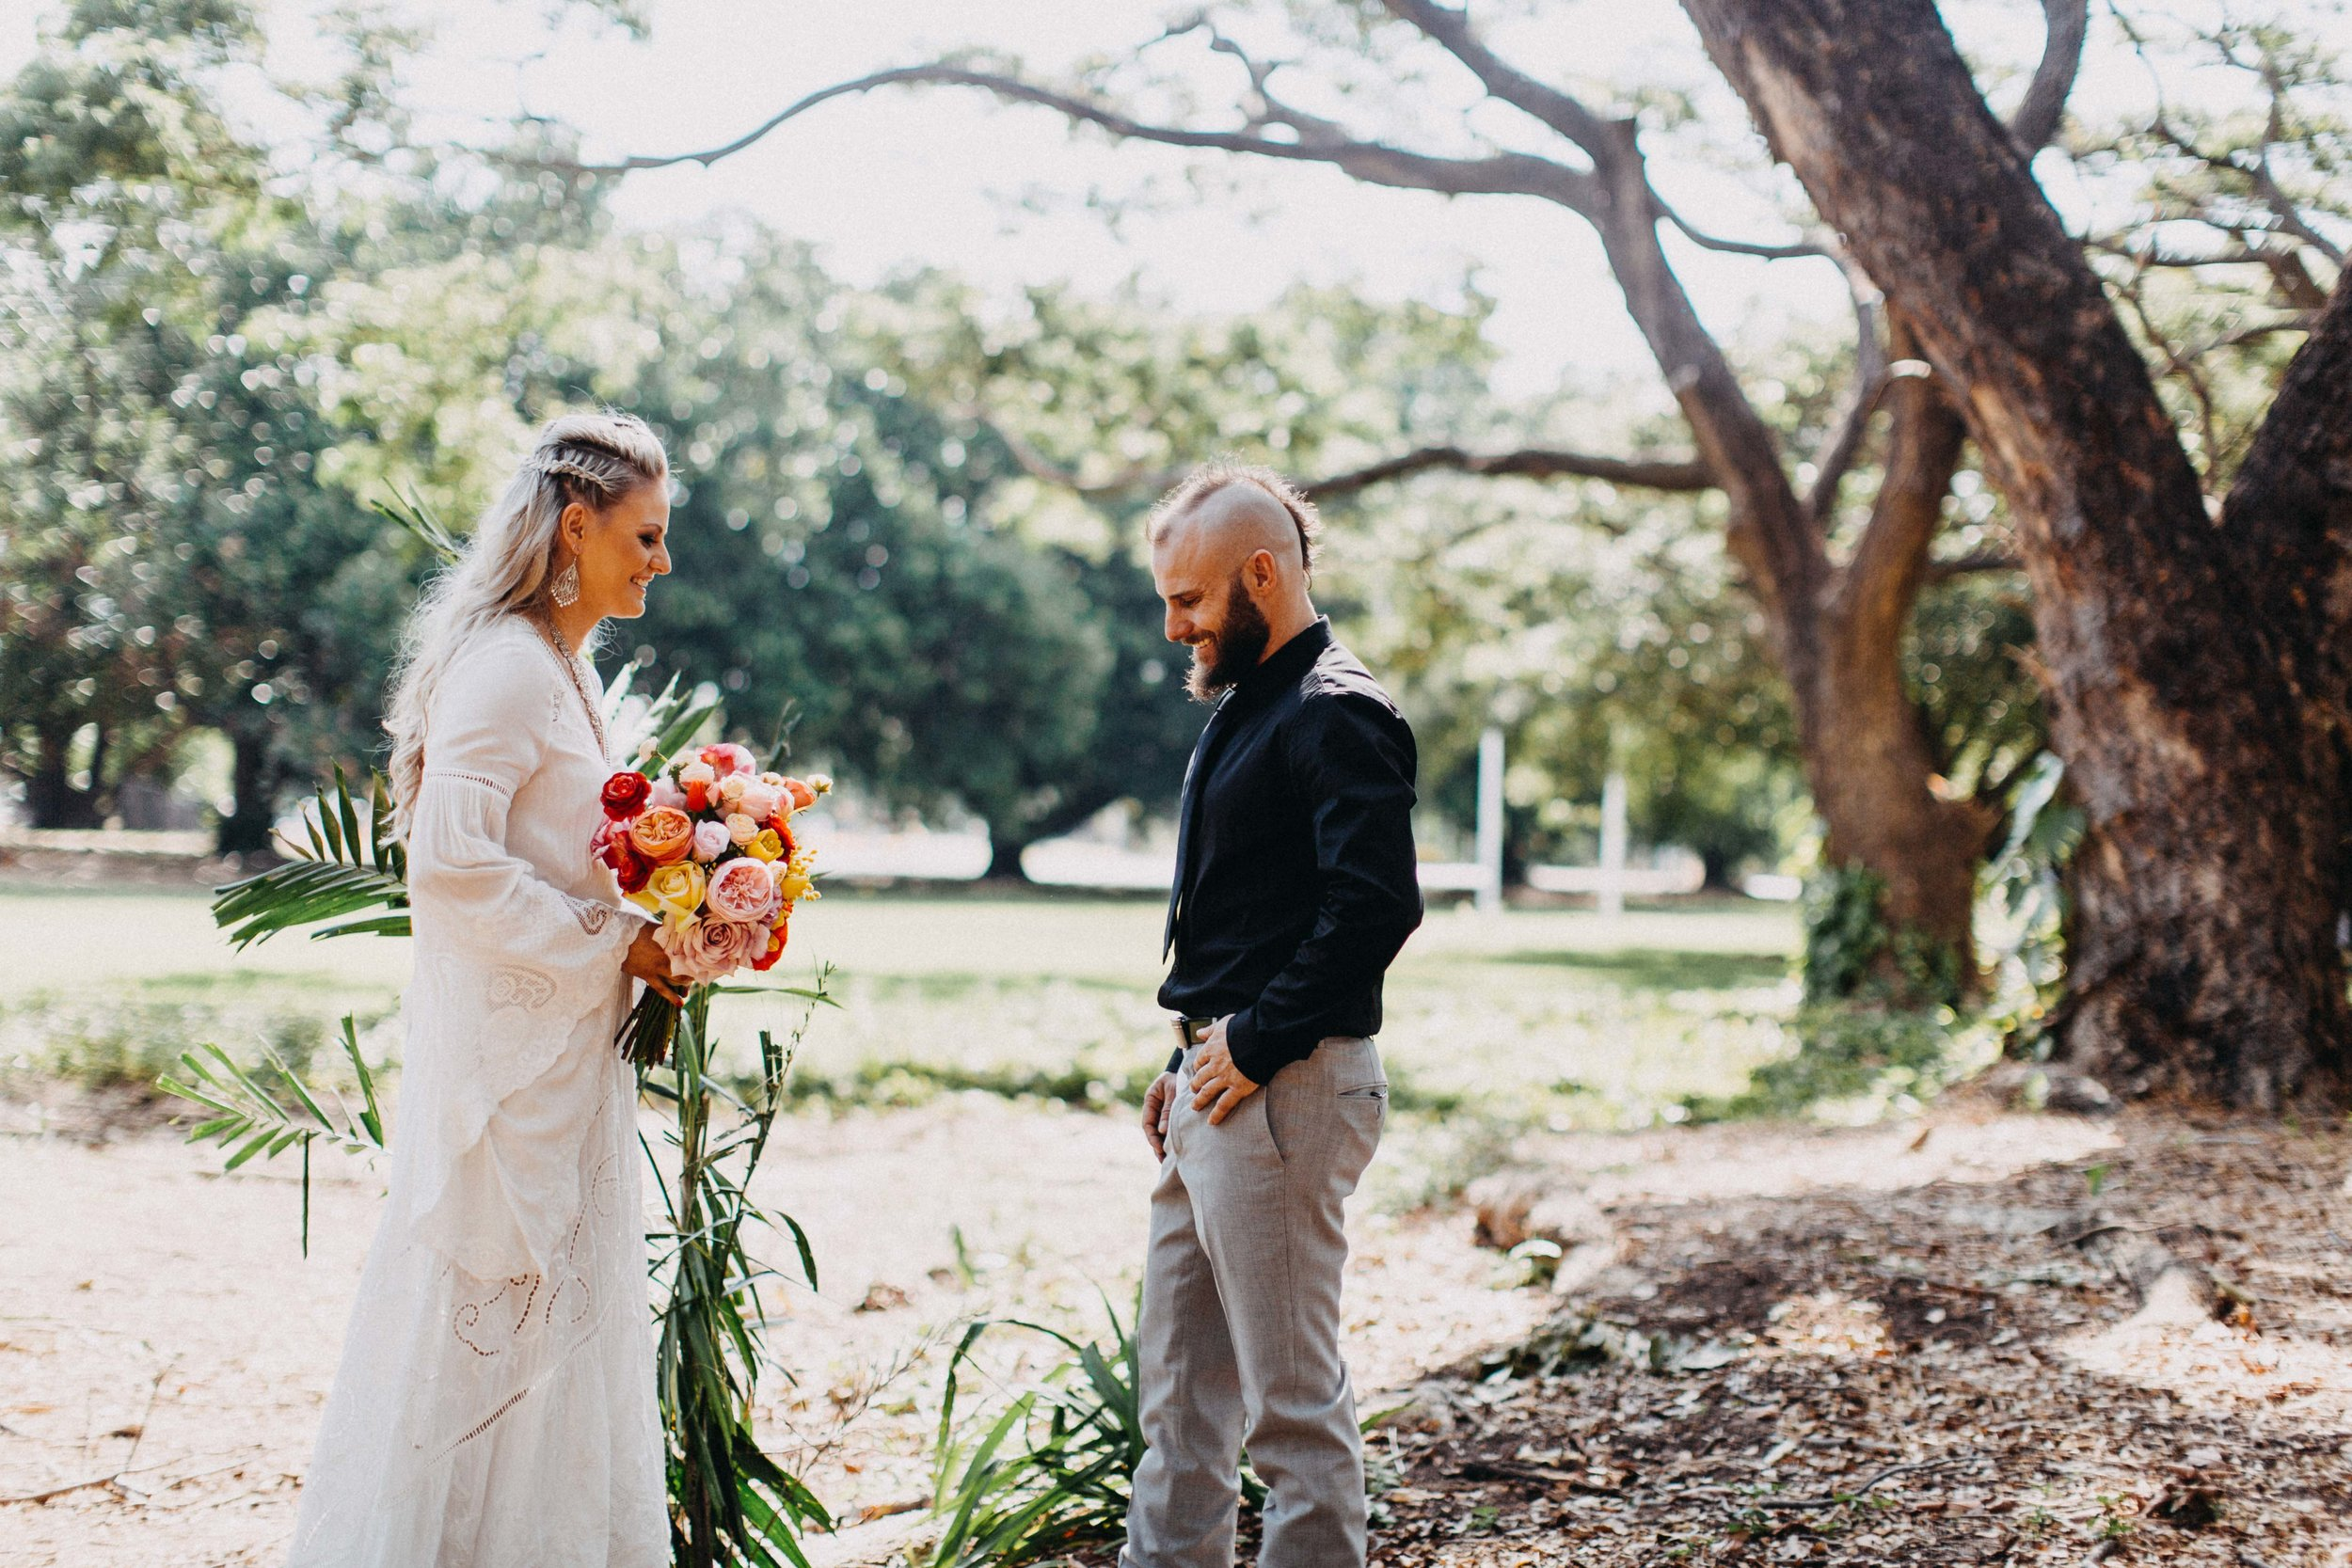 darwin-elopement-wedding-beach-camden-photography-www.emilyobrienphotography.net-5.jpg